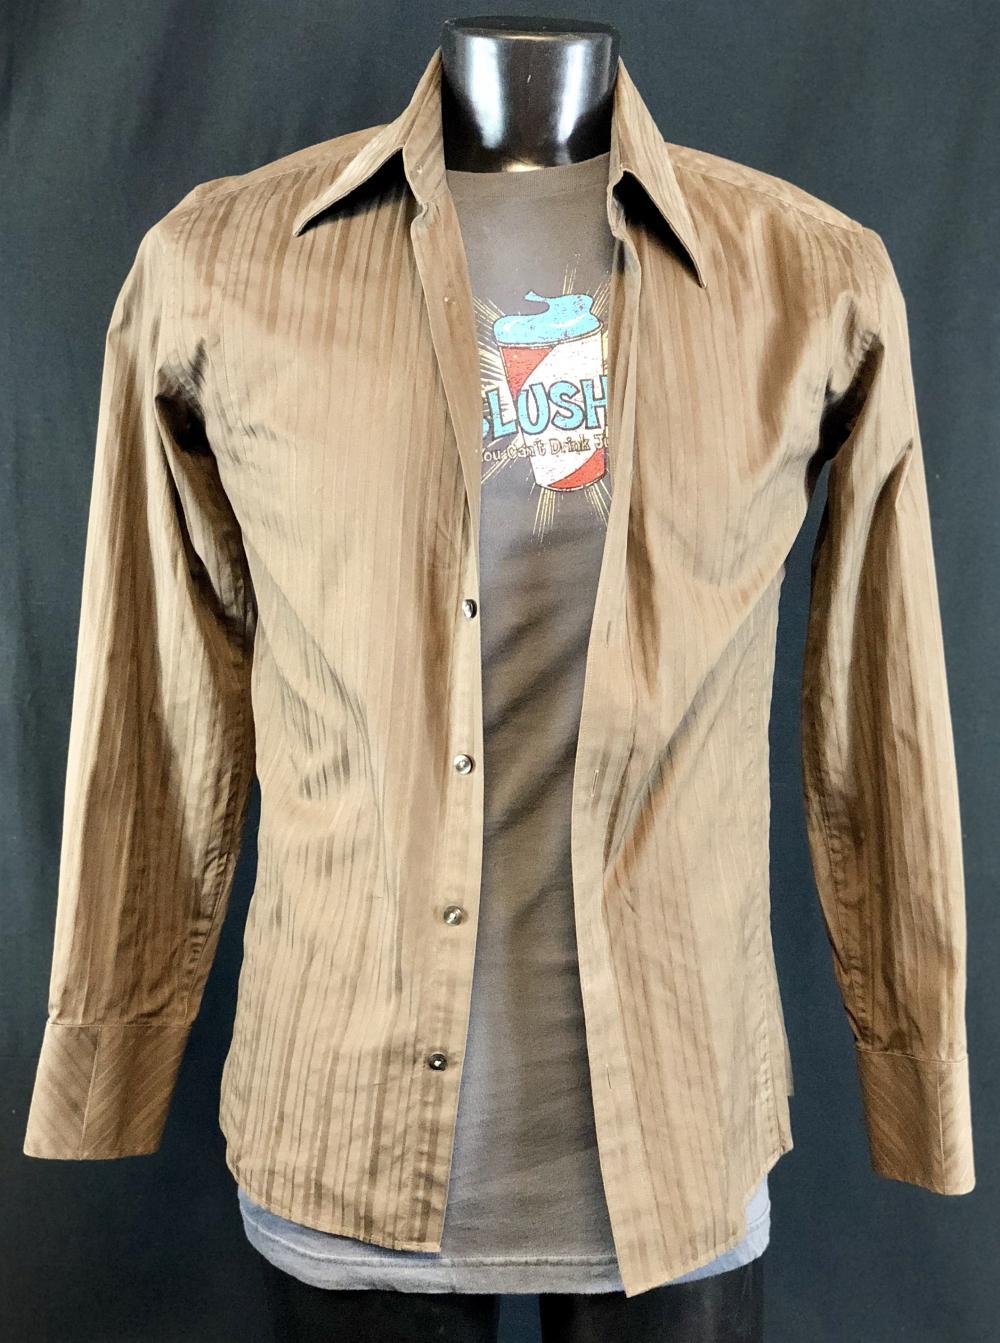 Cloverfield (2008) - Mike Vogel Jason Hawkins Slusho Shirt Lot